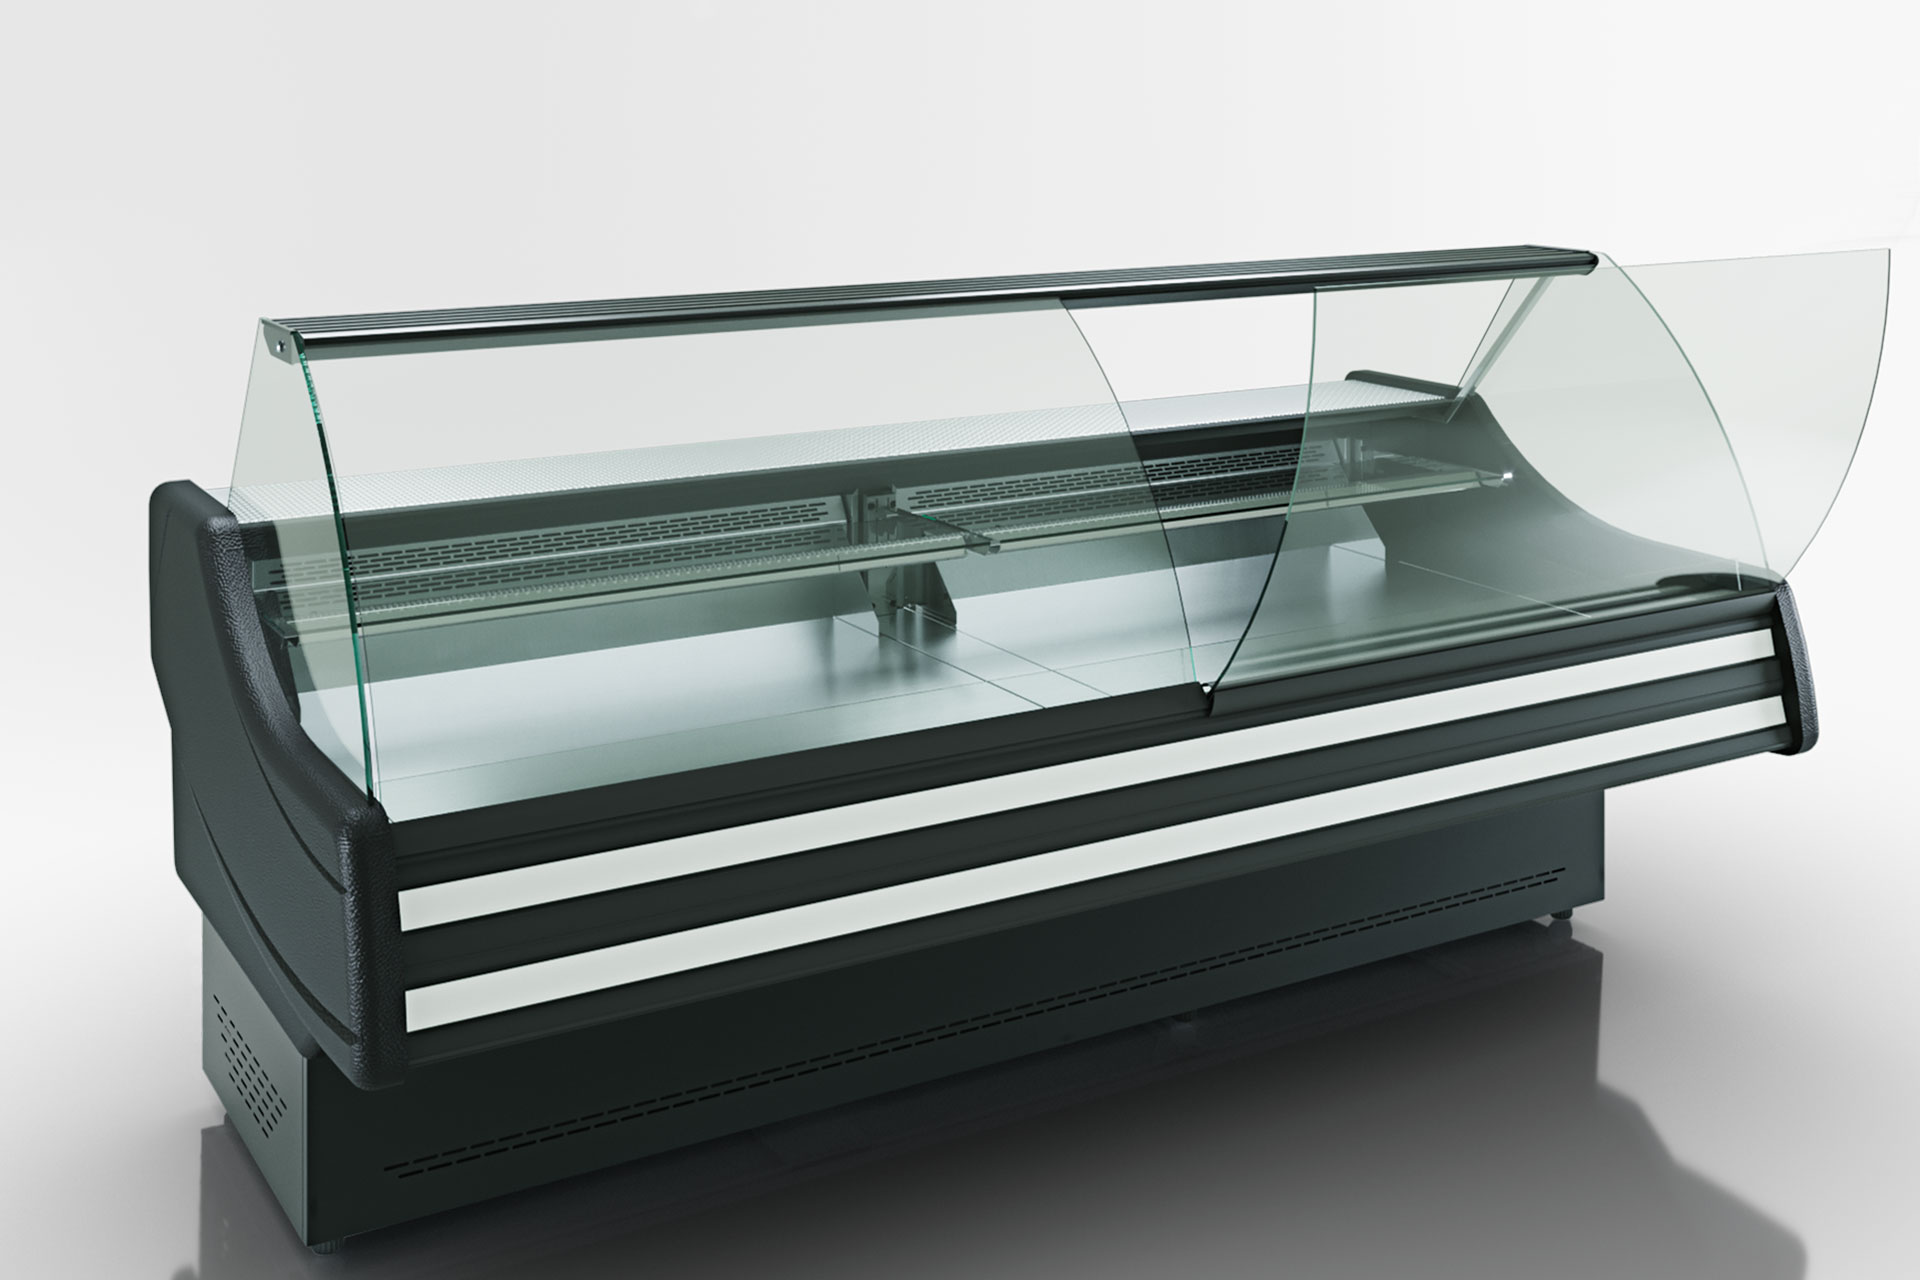 Counter Sonata AG 119 patisserie OS 125-DLA